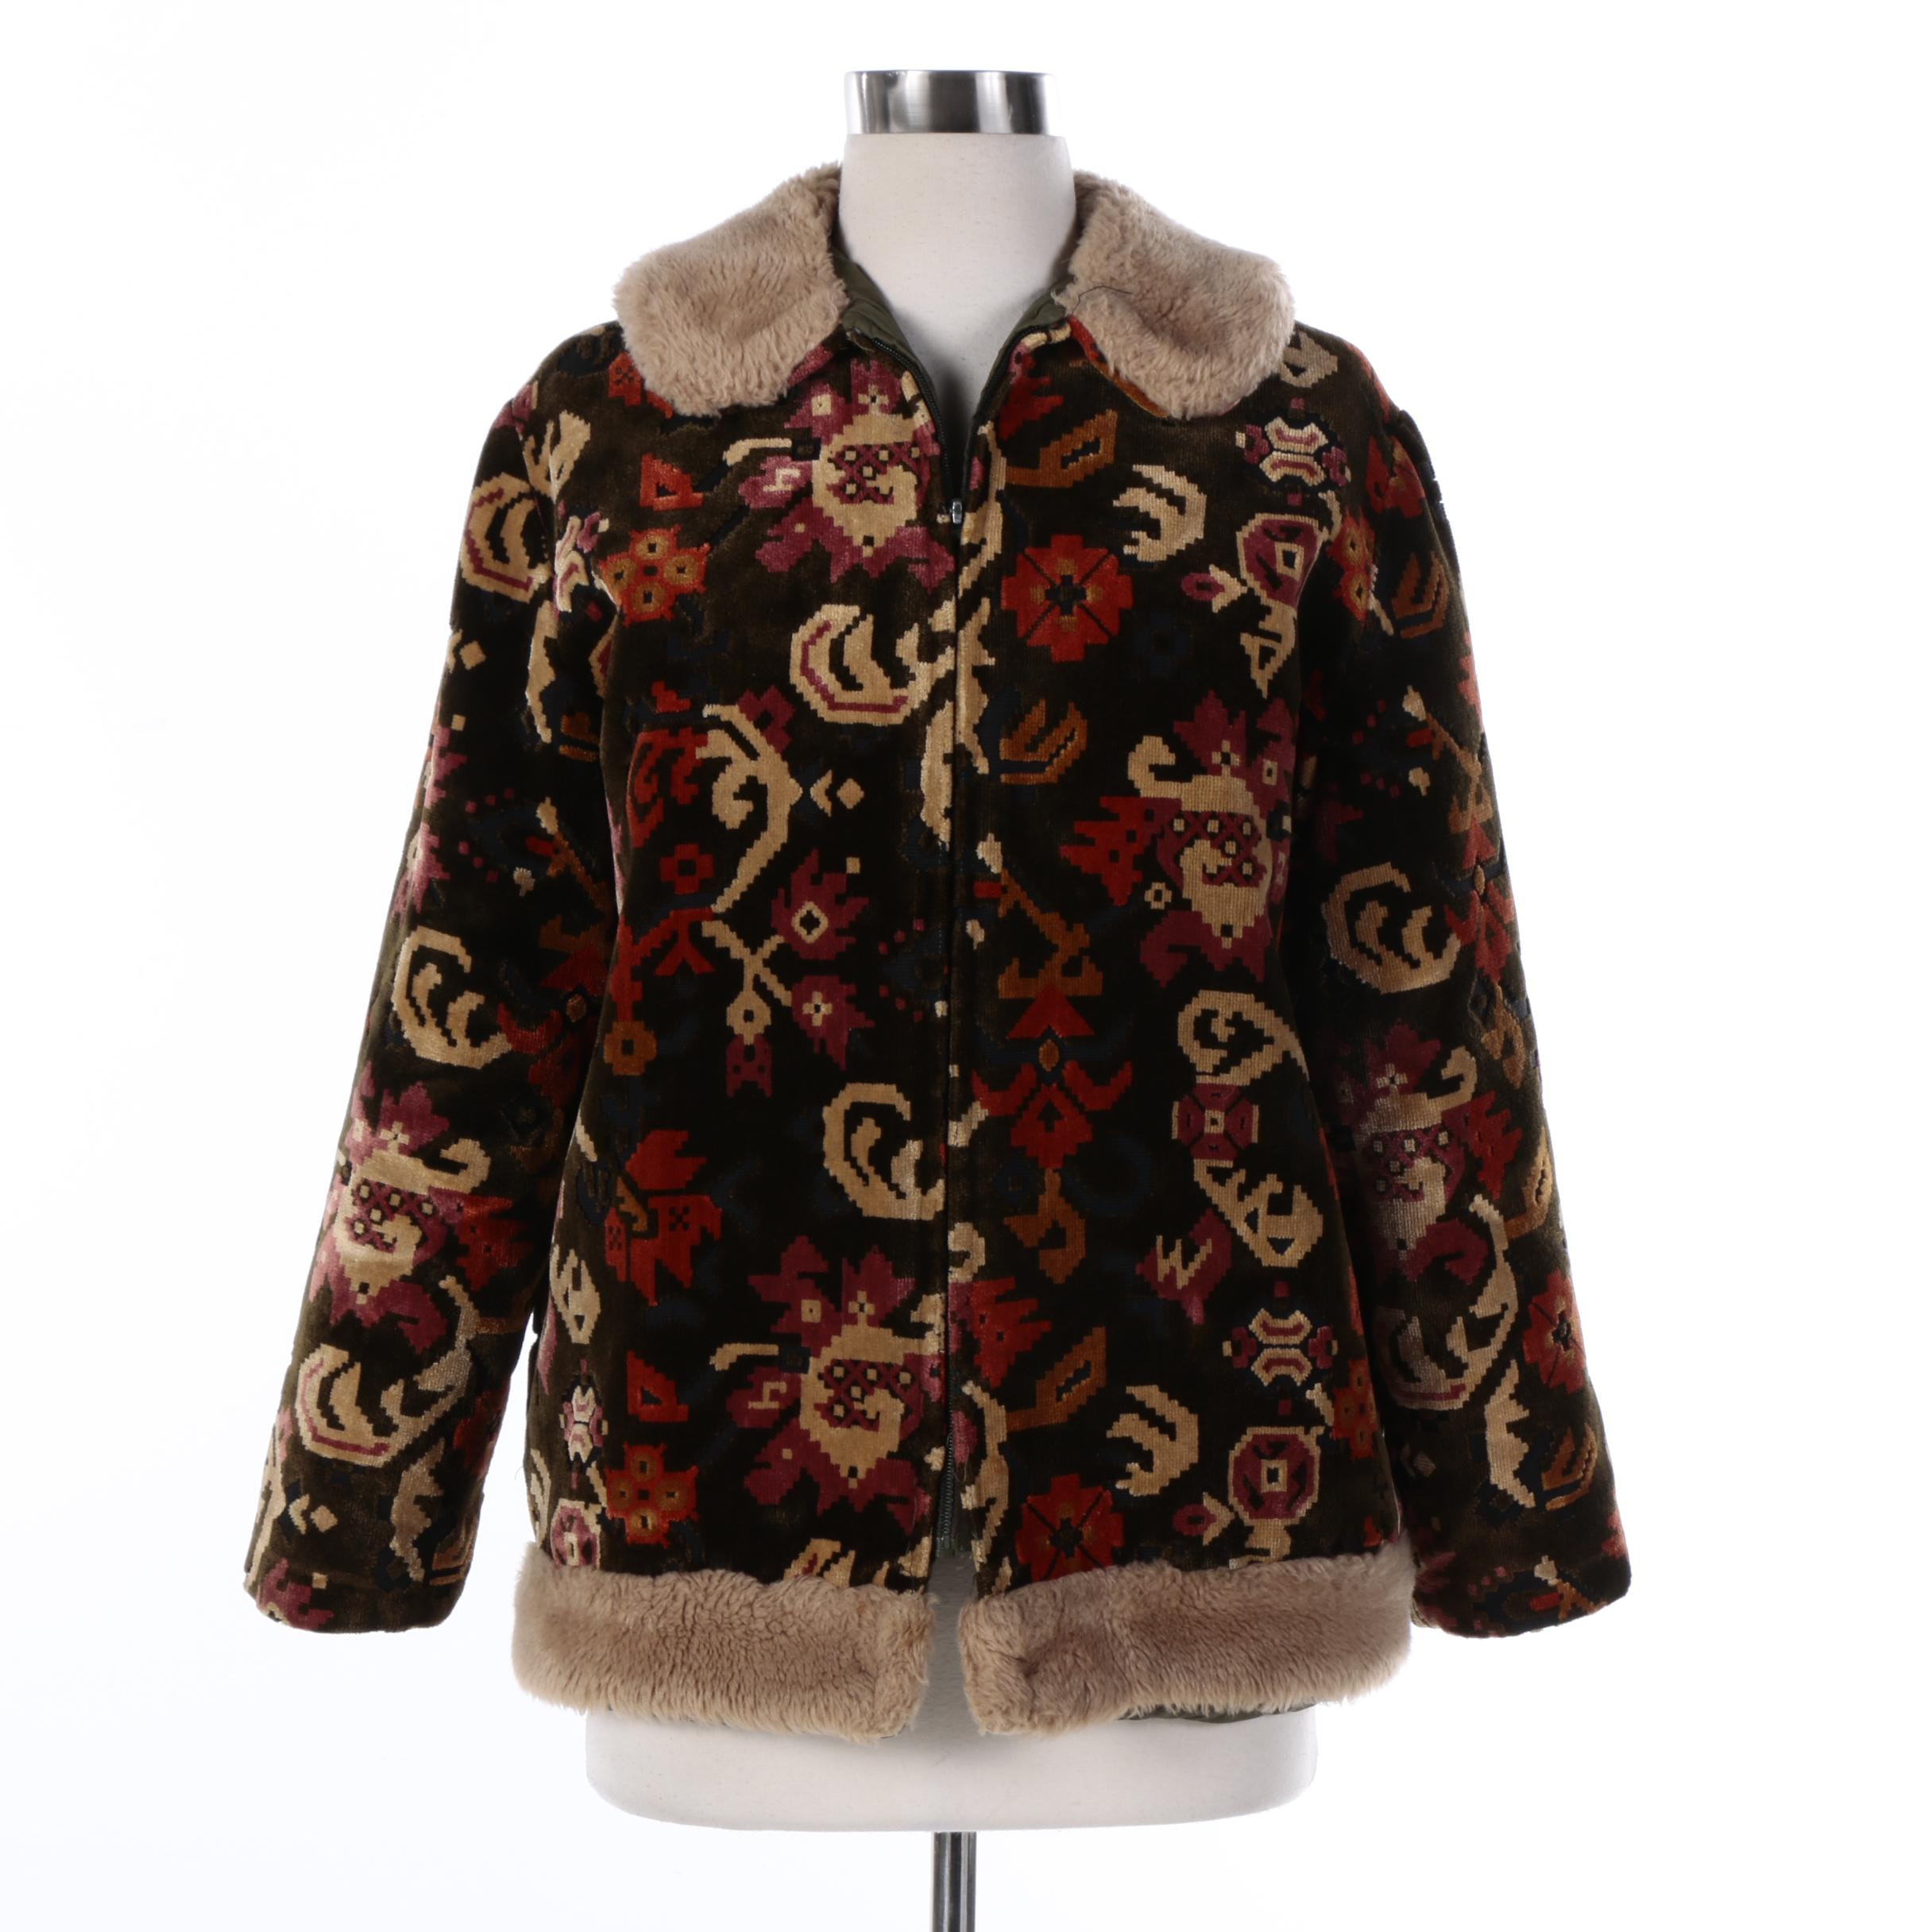 Vintage Valor Tapestry Print Zip Jacket with Faux Fur Trim